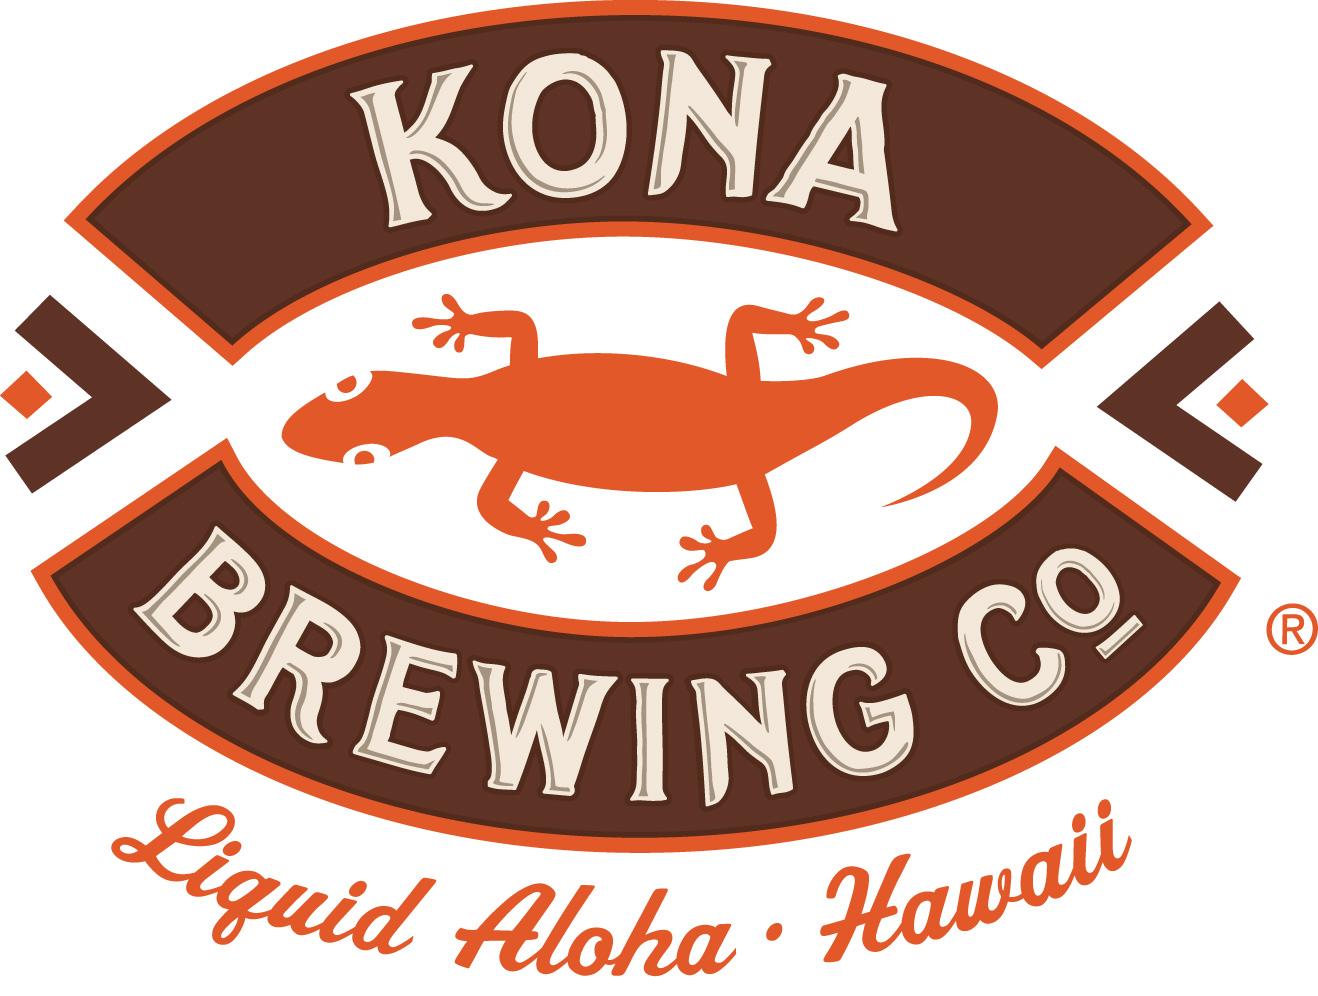 Kona Big Wave Golden Ale Brewery International